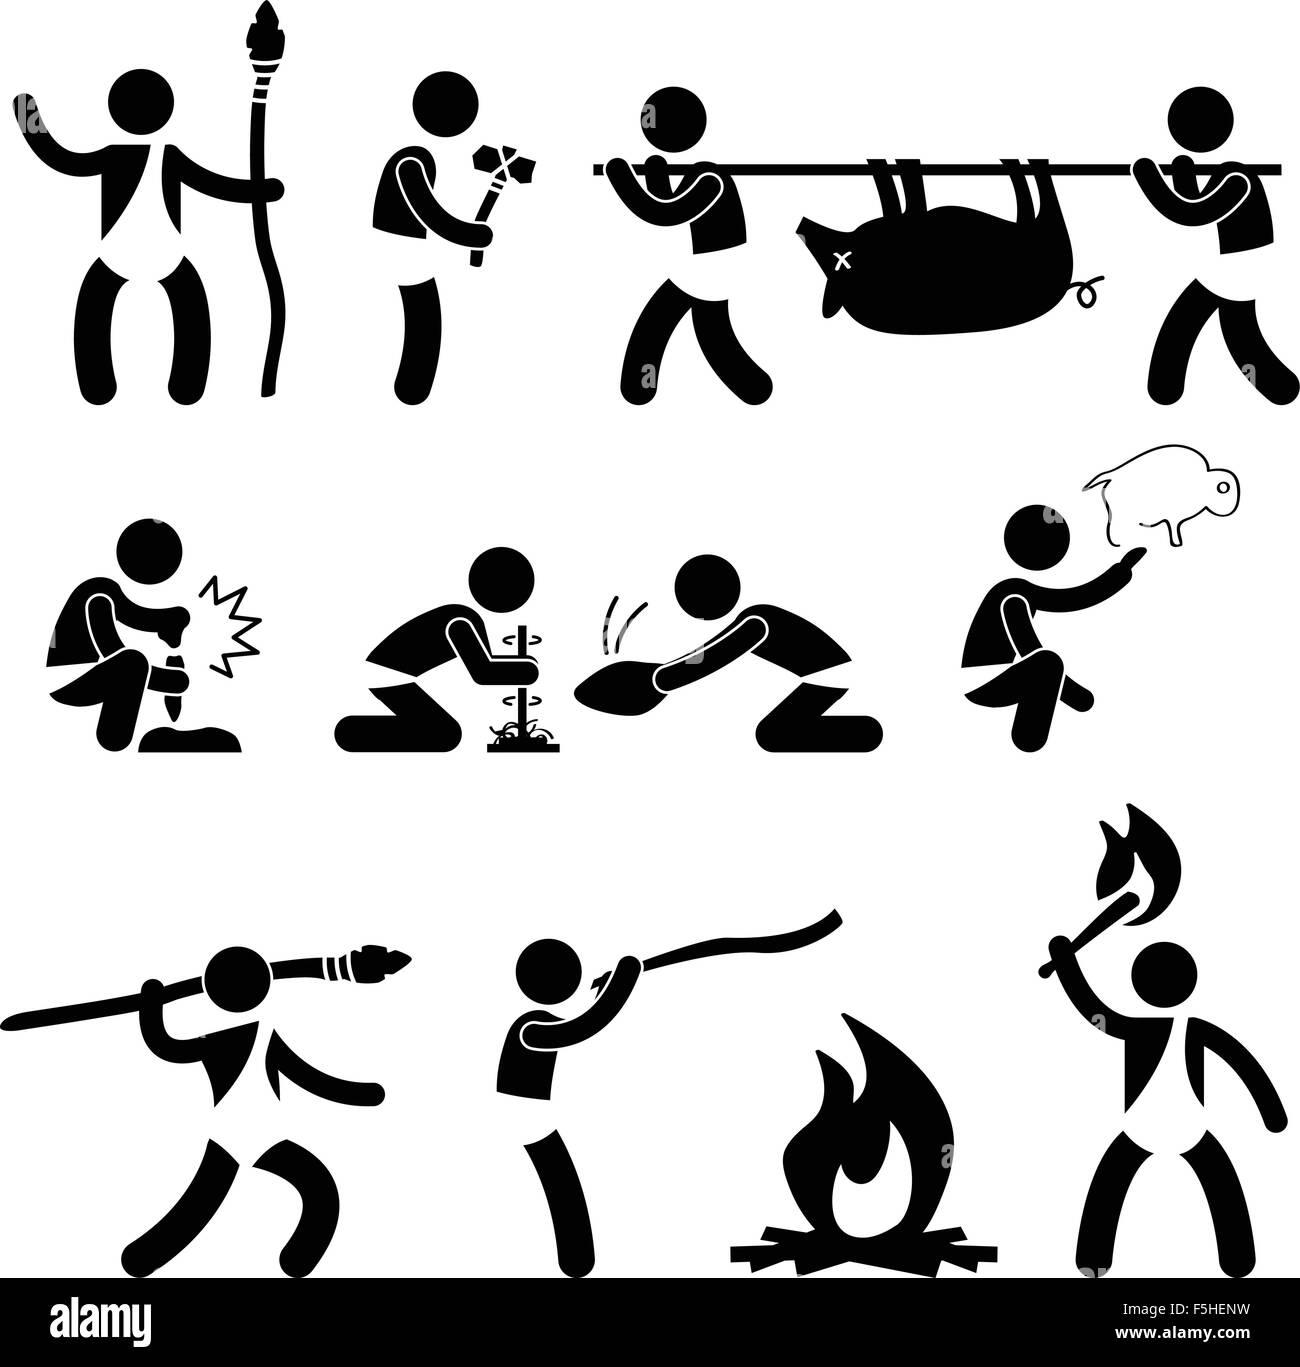 Primitive Ancient Prehistoric Caveman Man Human using Tool and Equipment Icon Symbol Sign Pictogram - Stock Image